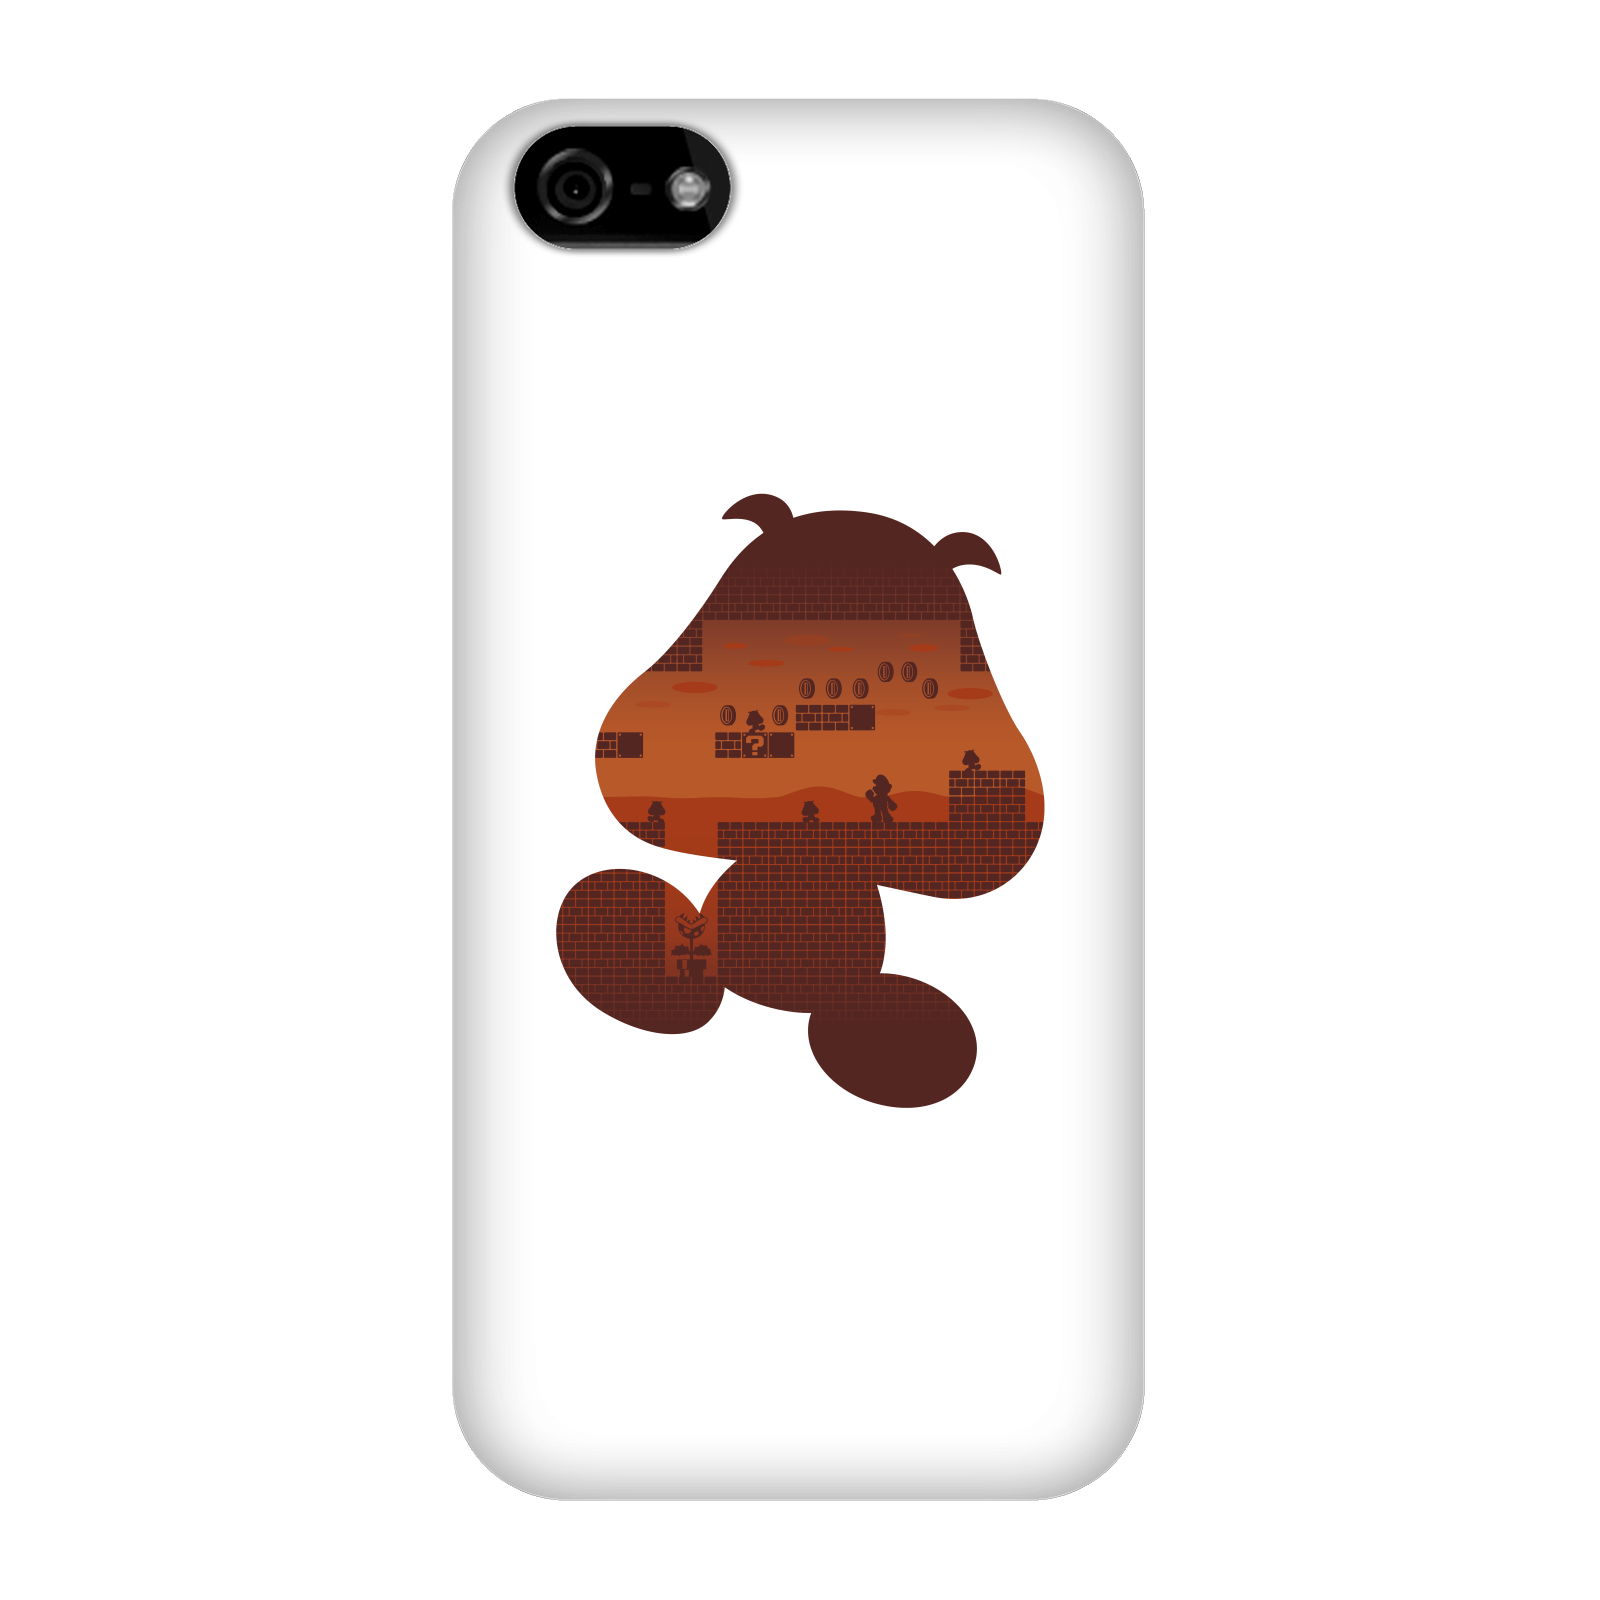 Nintendo Super Mario Goomba Silhouette Smartphone Hülle - iPhone 5C - Snap Hülle Matt